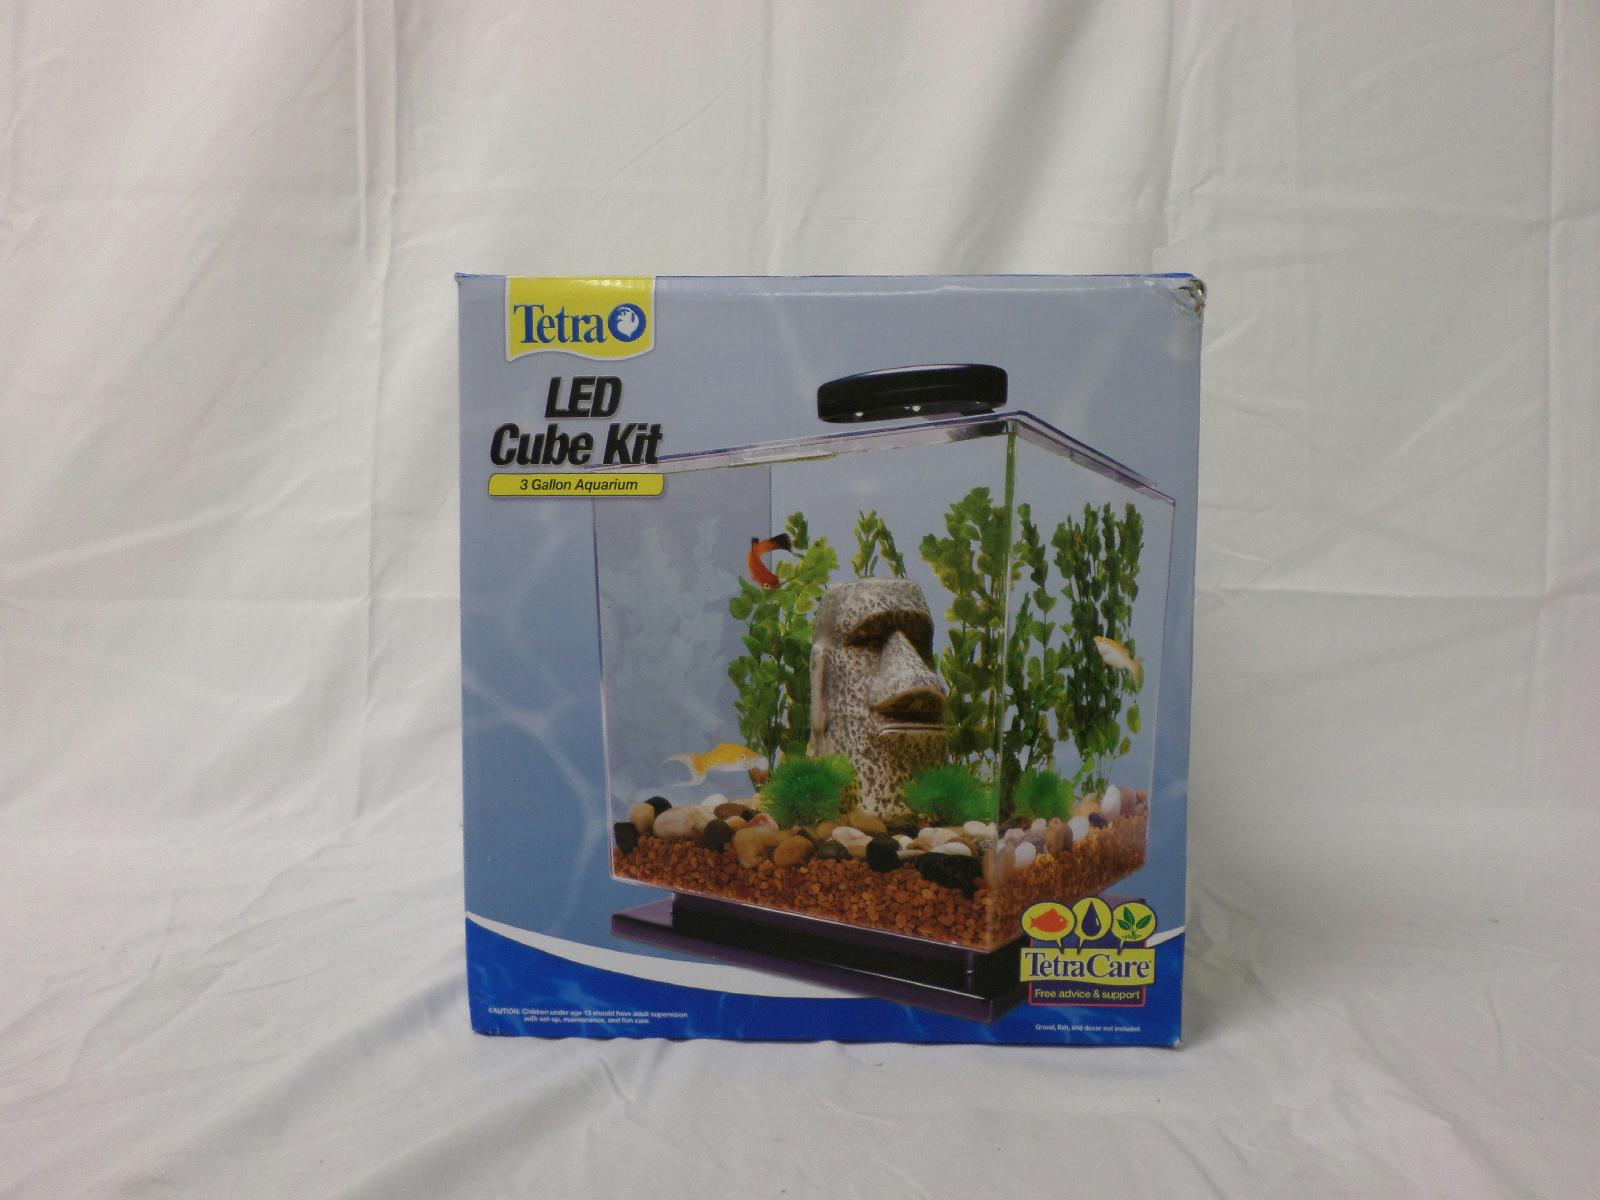 Tetra 29095 cube aquarium kit 3 gallon led lights ebay for Aquarium cube